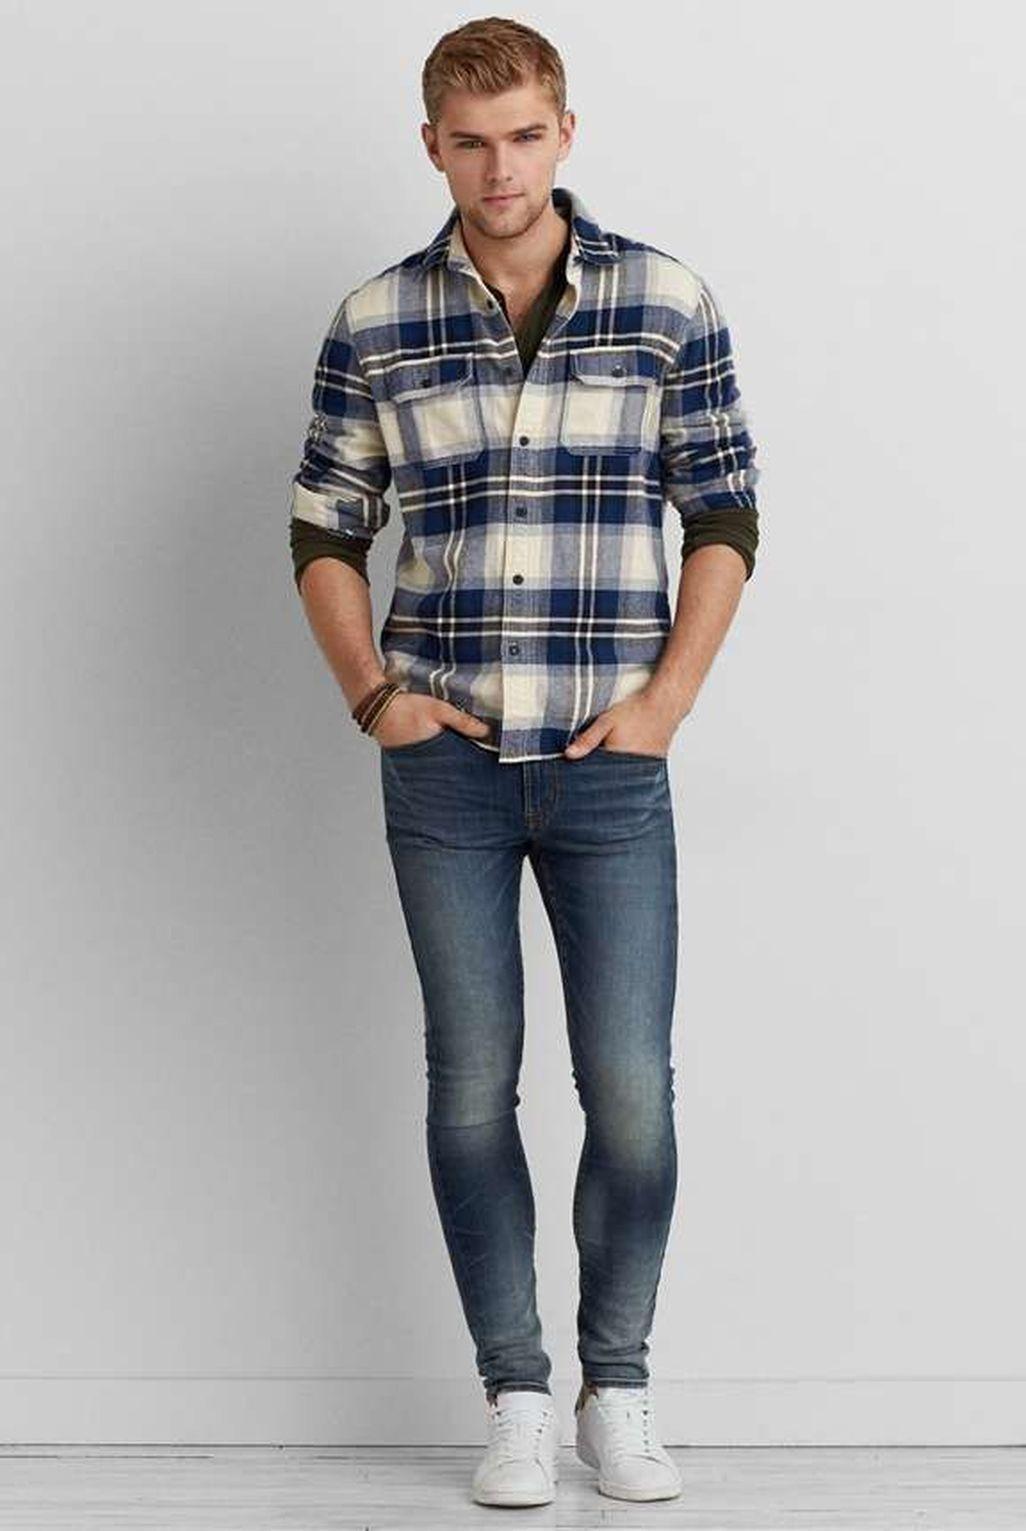 nice 45 inspiring fashion ideas to wear skinny jeans more. Black Bedroom Furniture Sets. Home Design Ideas